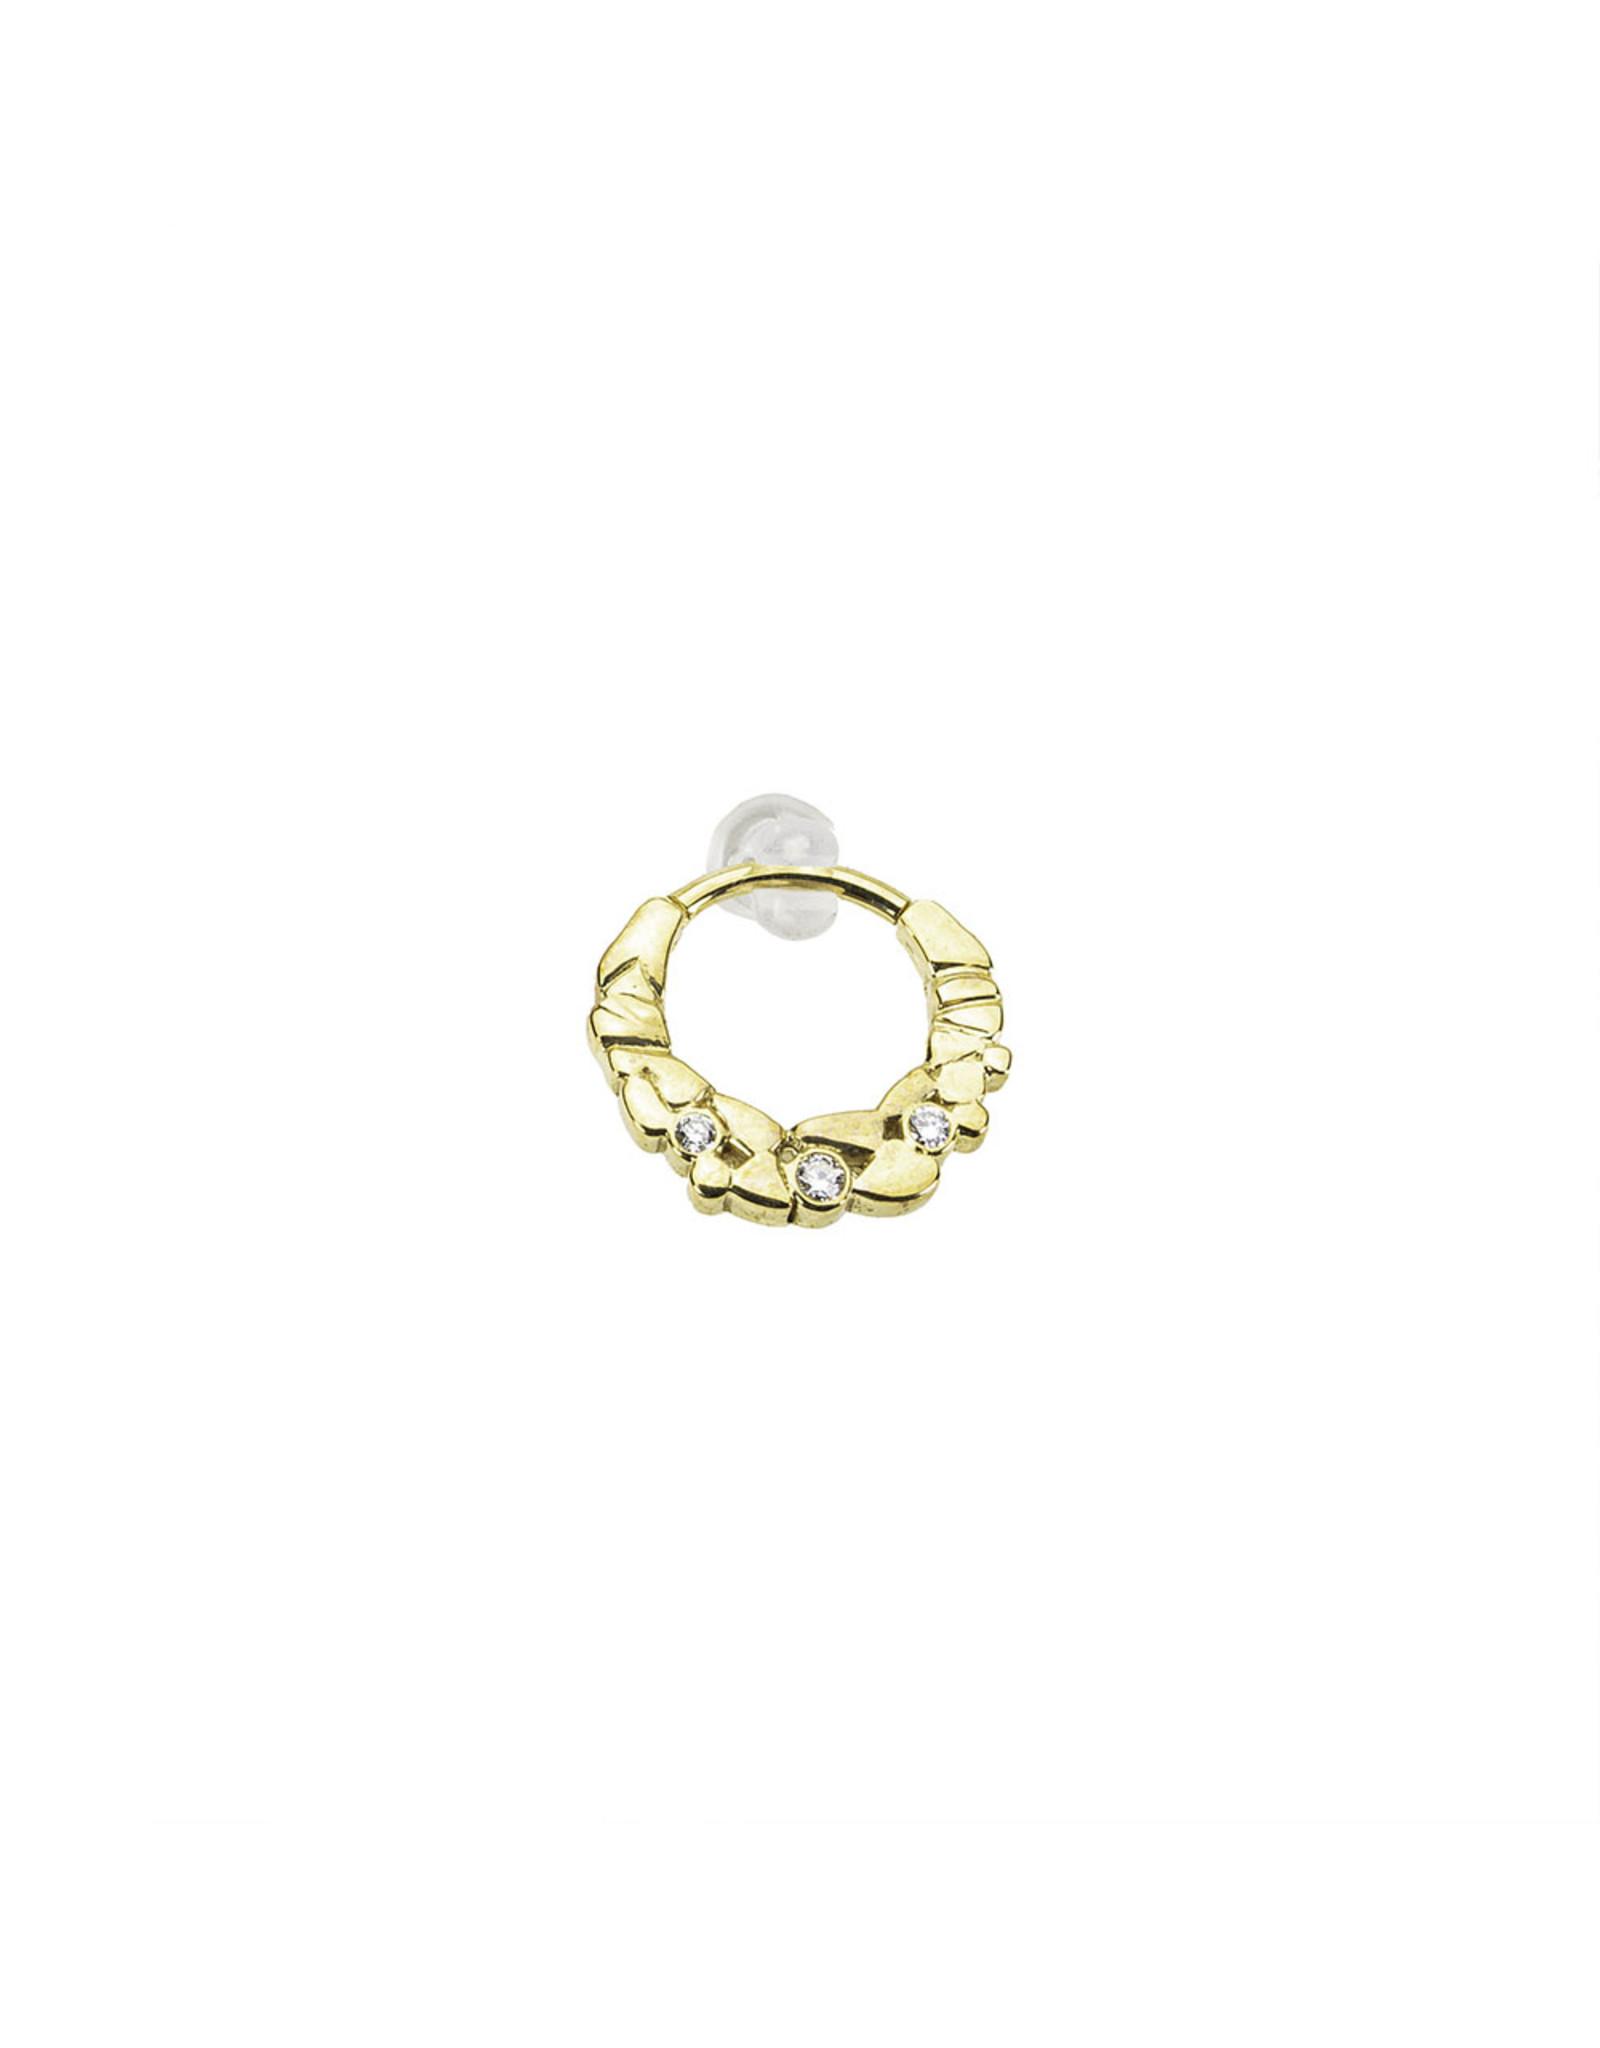 "BVLA BVLA 16g Yellow Gold ""Pebbles"" clicker with 3x VS1 diamonds"